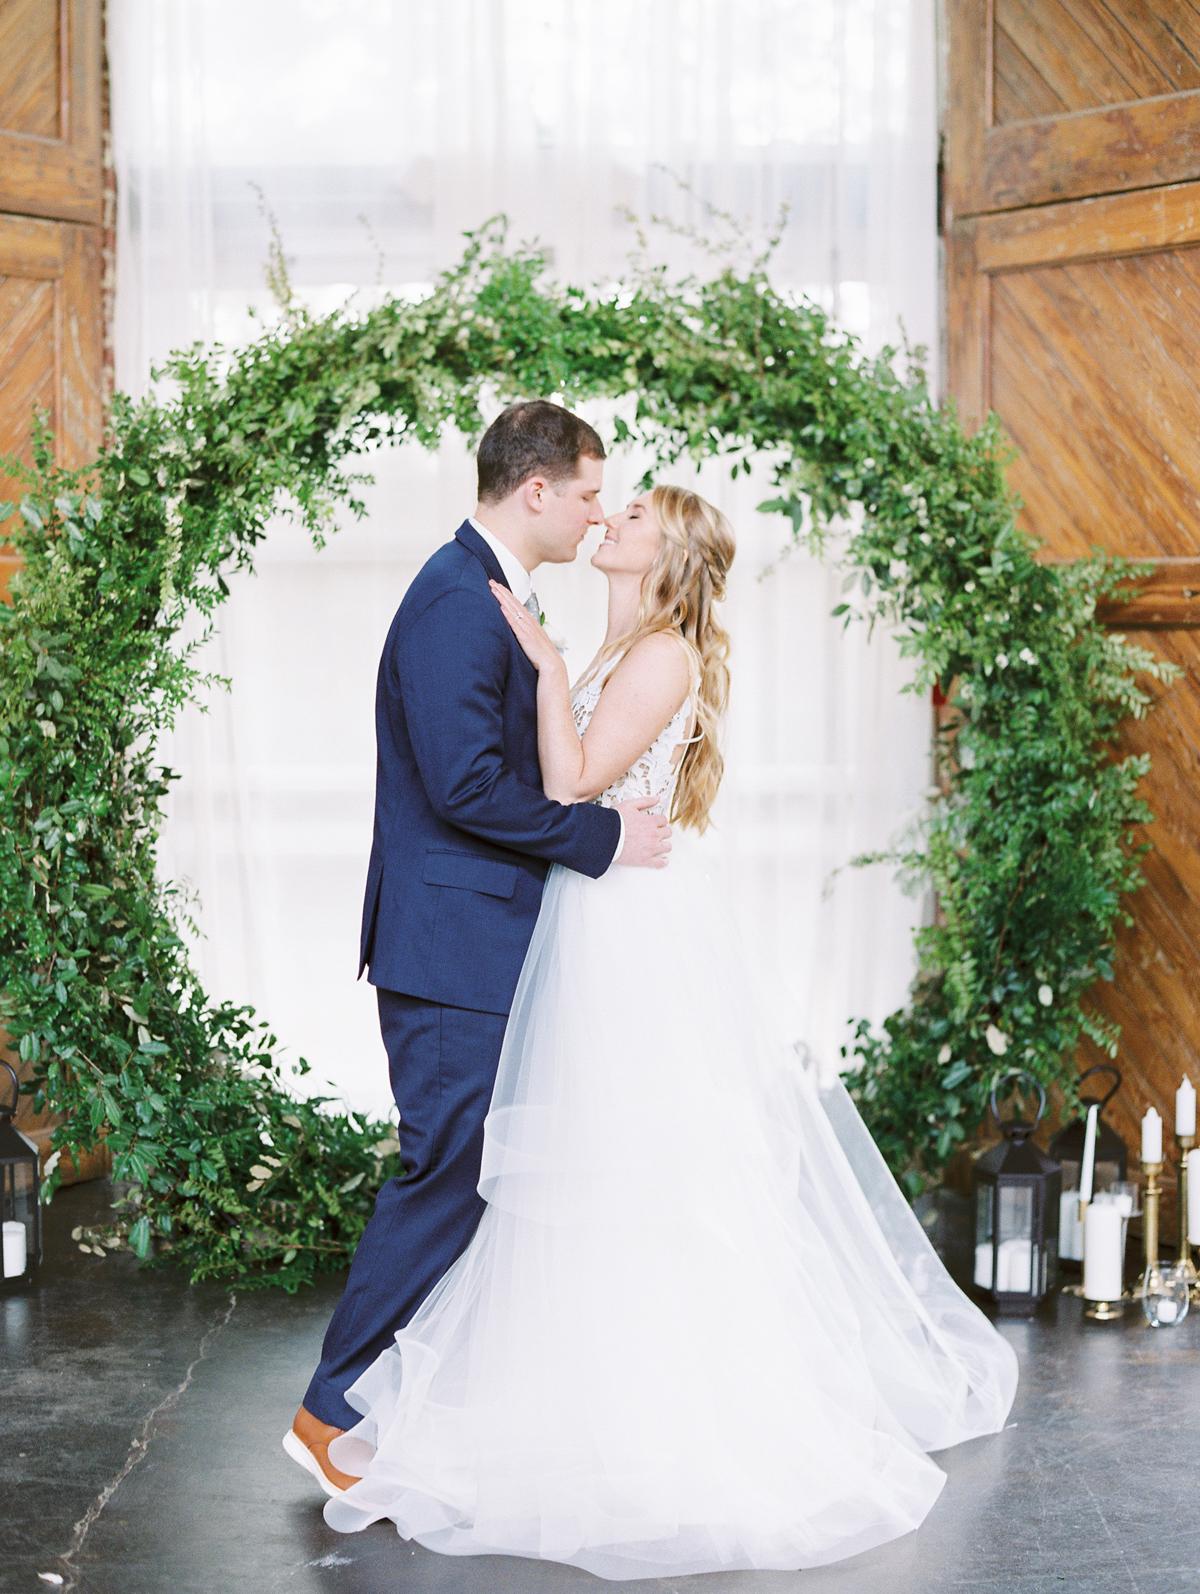 Foundry-At-Puritan-Mill-wedding-photos-venue-atlanta-fine-art-film-photographer20.JPG